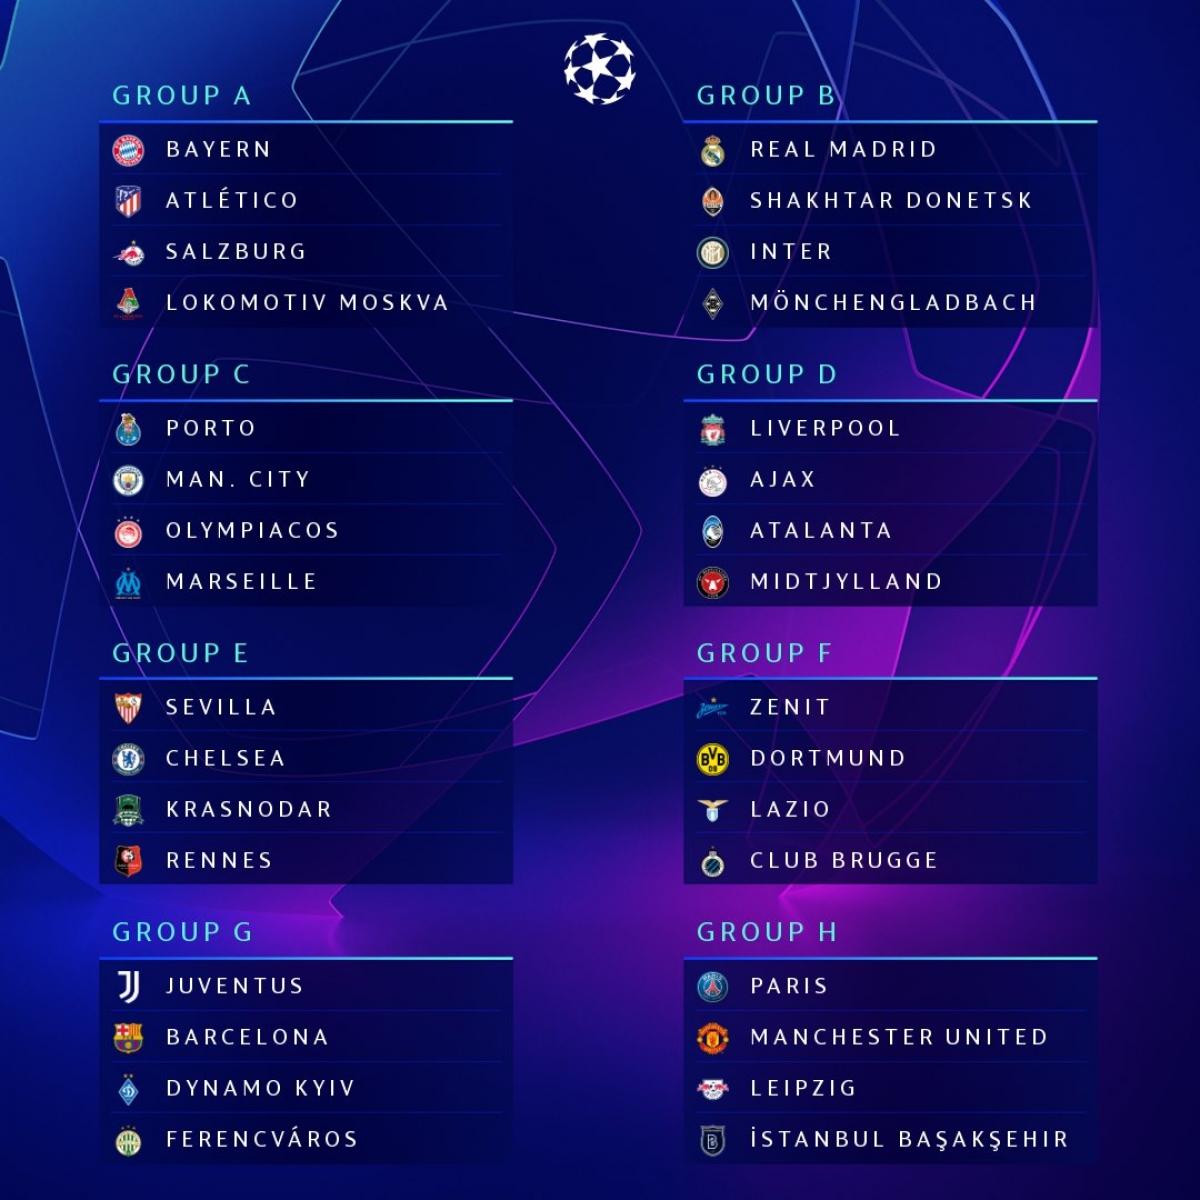 Kết quả bốc thăm vòng bảng Champions League 2020/2021. (Ảnh: UEFA)